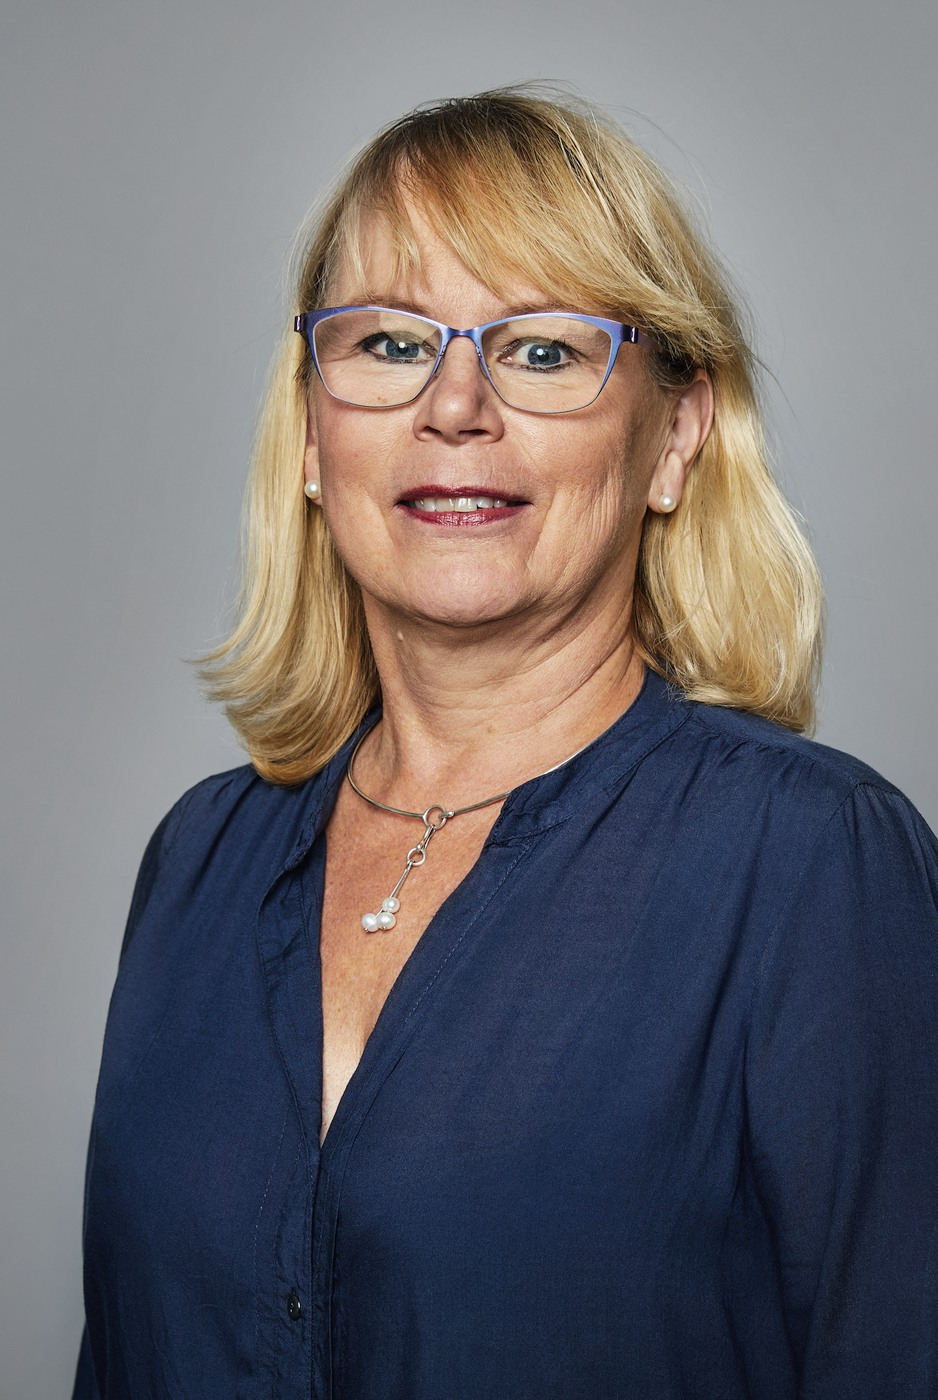 Yvonne Brandberg, psykolog och cancerforskare